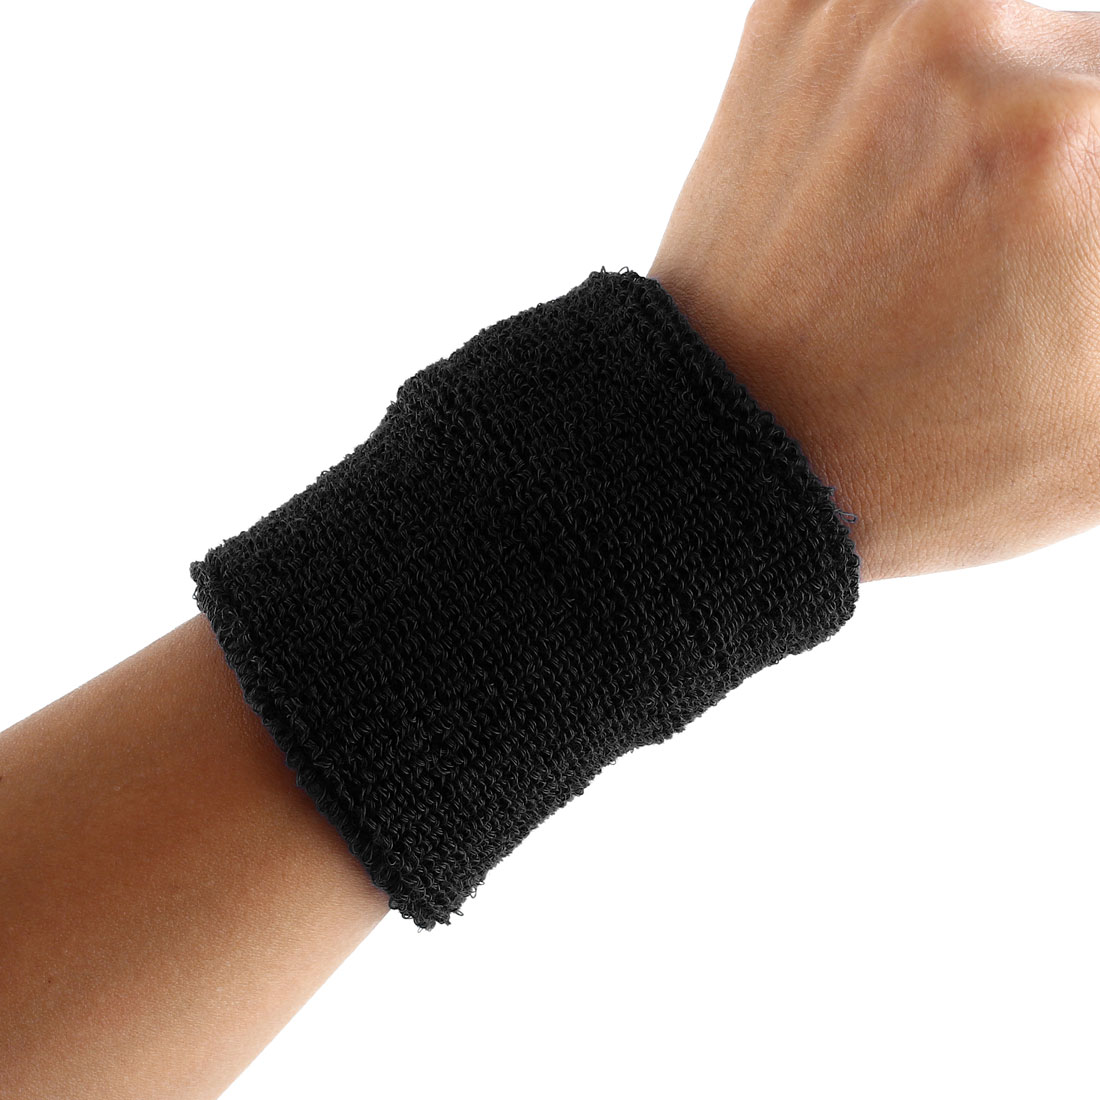 Exercises Gym Running Elastic Breathable Hand Protector Bandage Sweatband Wristband Sport Wrist Black 2pcs